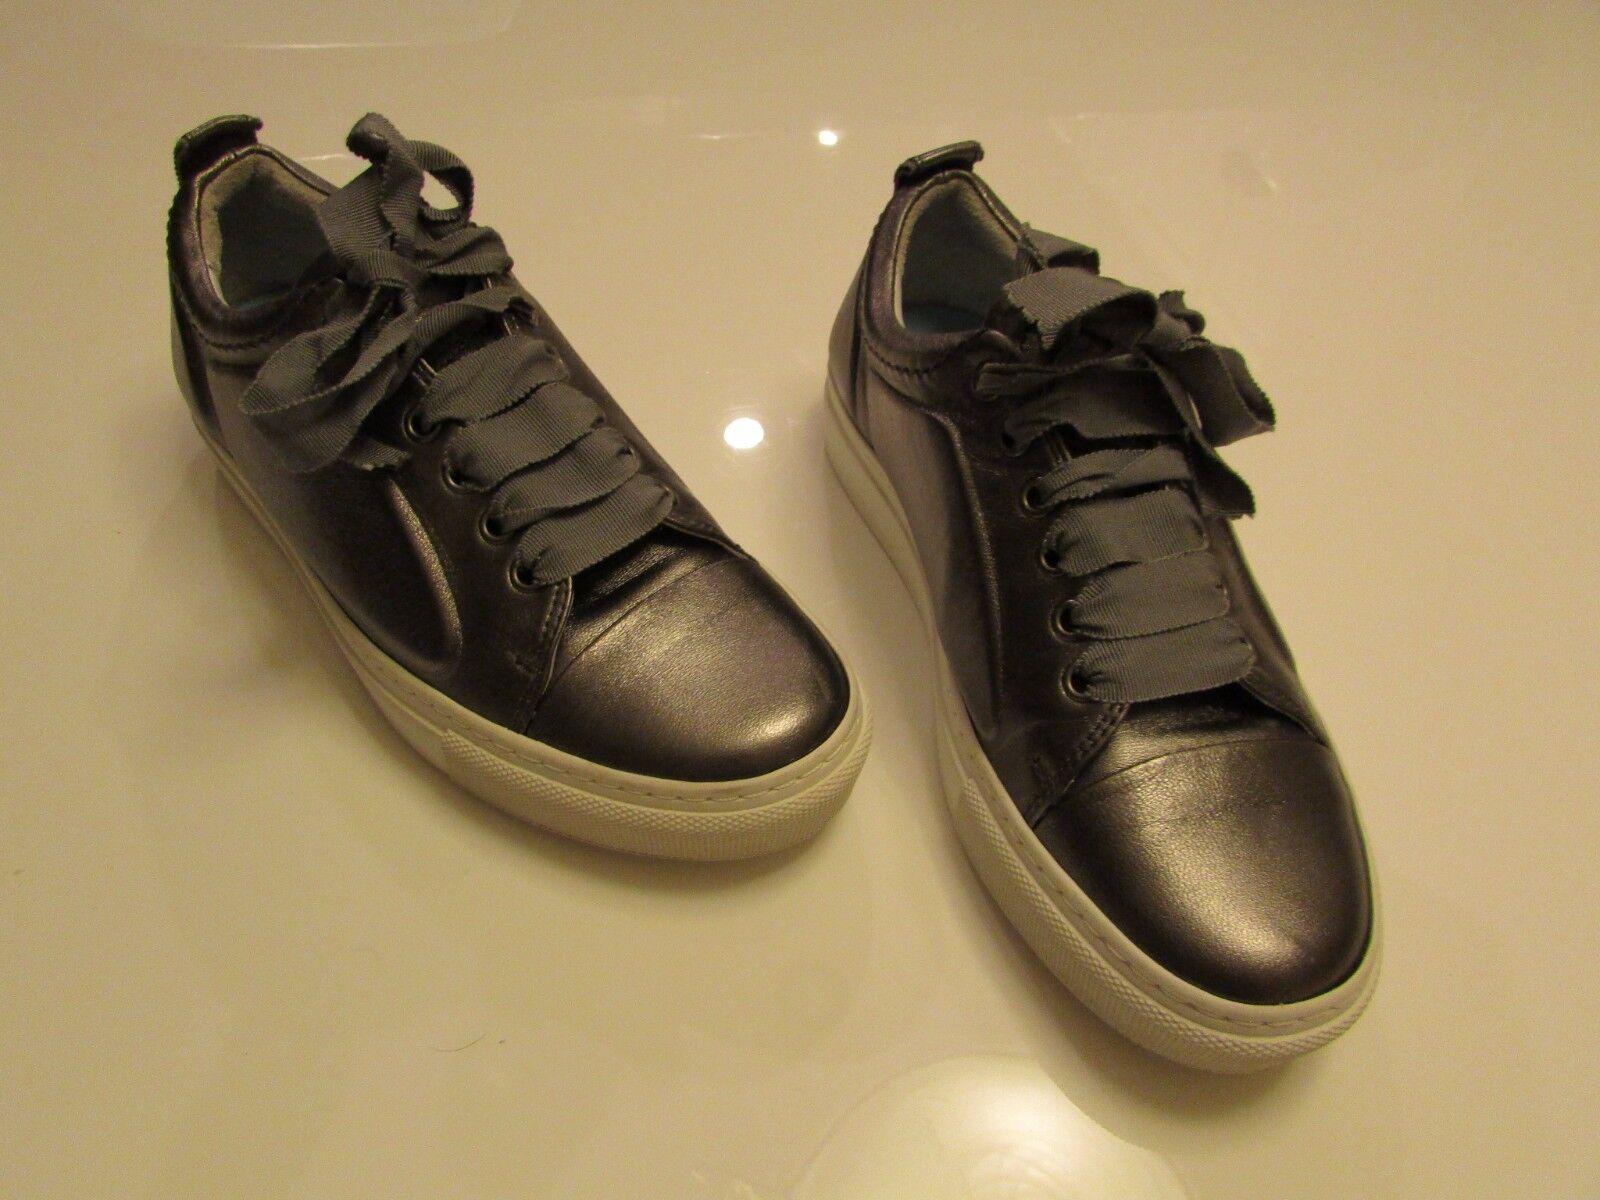 Lanvin Cap-Toe Metallic Olive Green Leather Low-Top Basketball Basketball Basketball Sneakers   37 5dd8a1